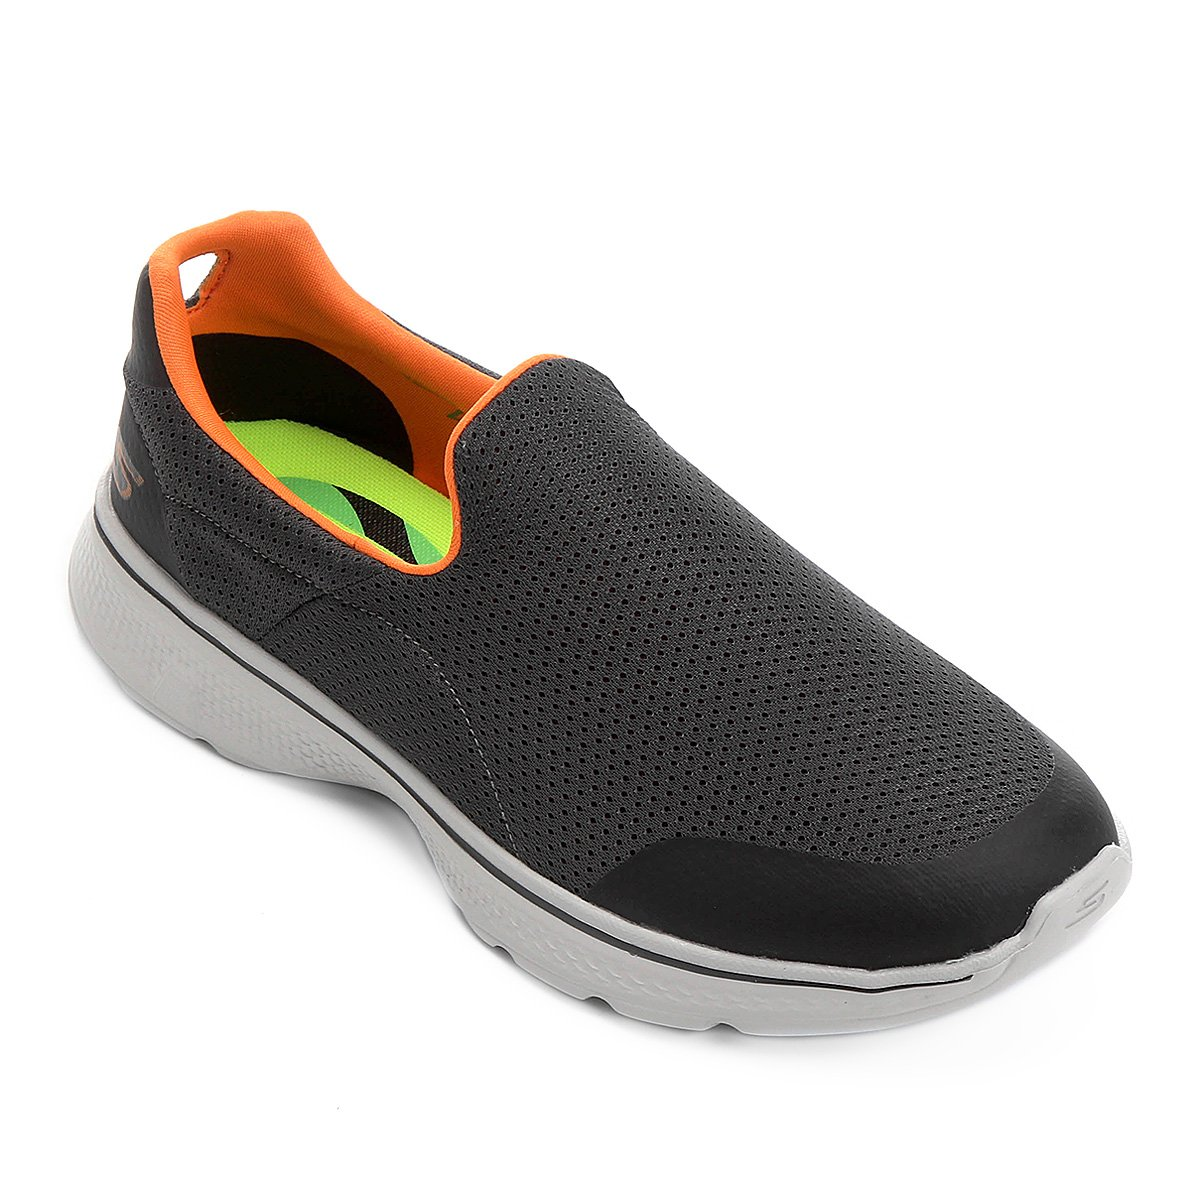 Tênis Skechers GOwalk 4 - Incredible Masculino - Cinza e Laranja ... 83561b5875867